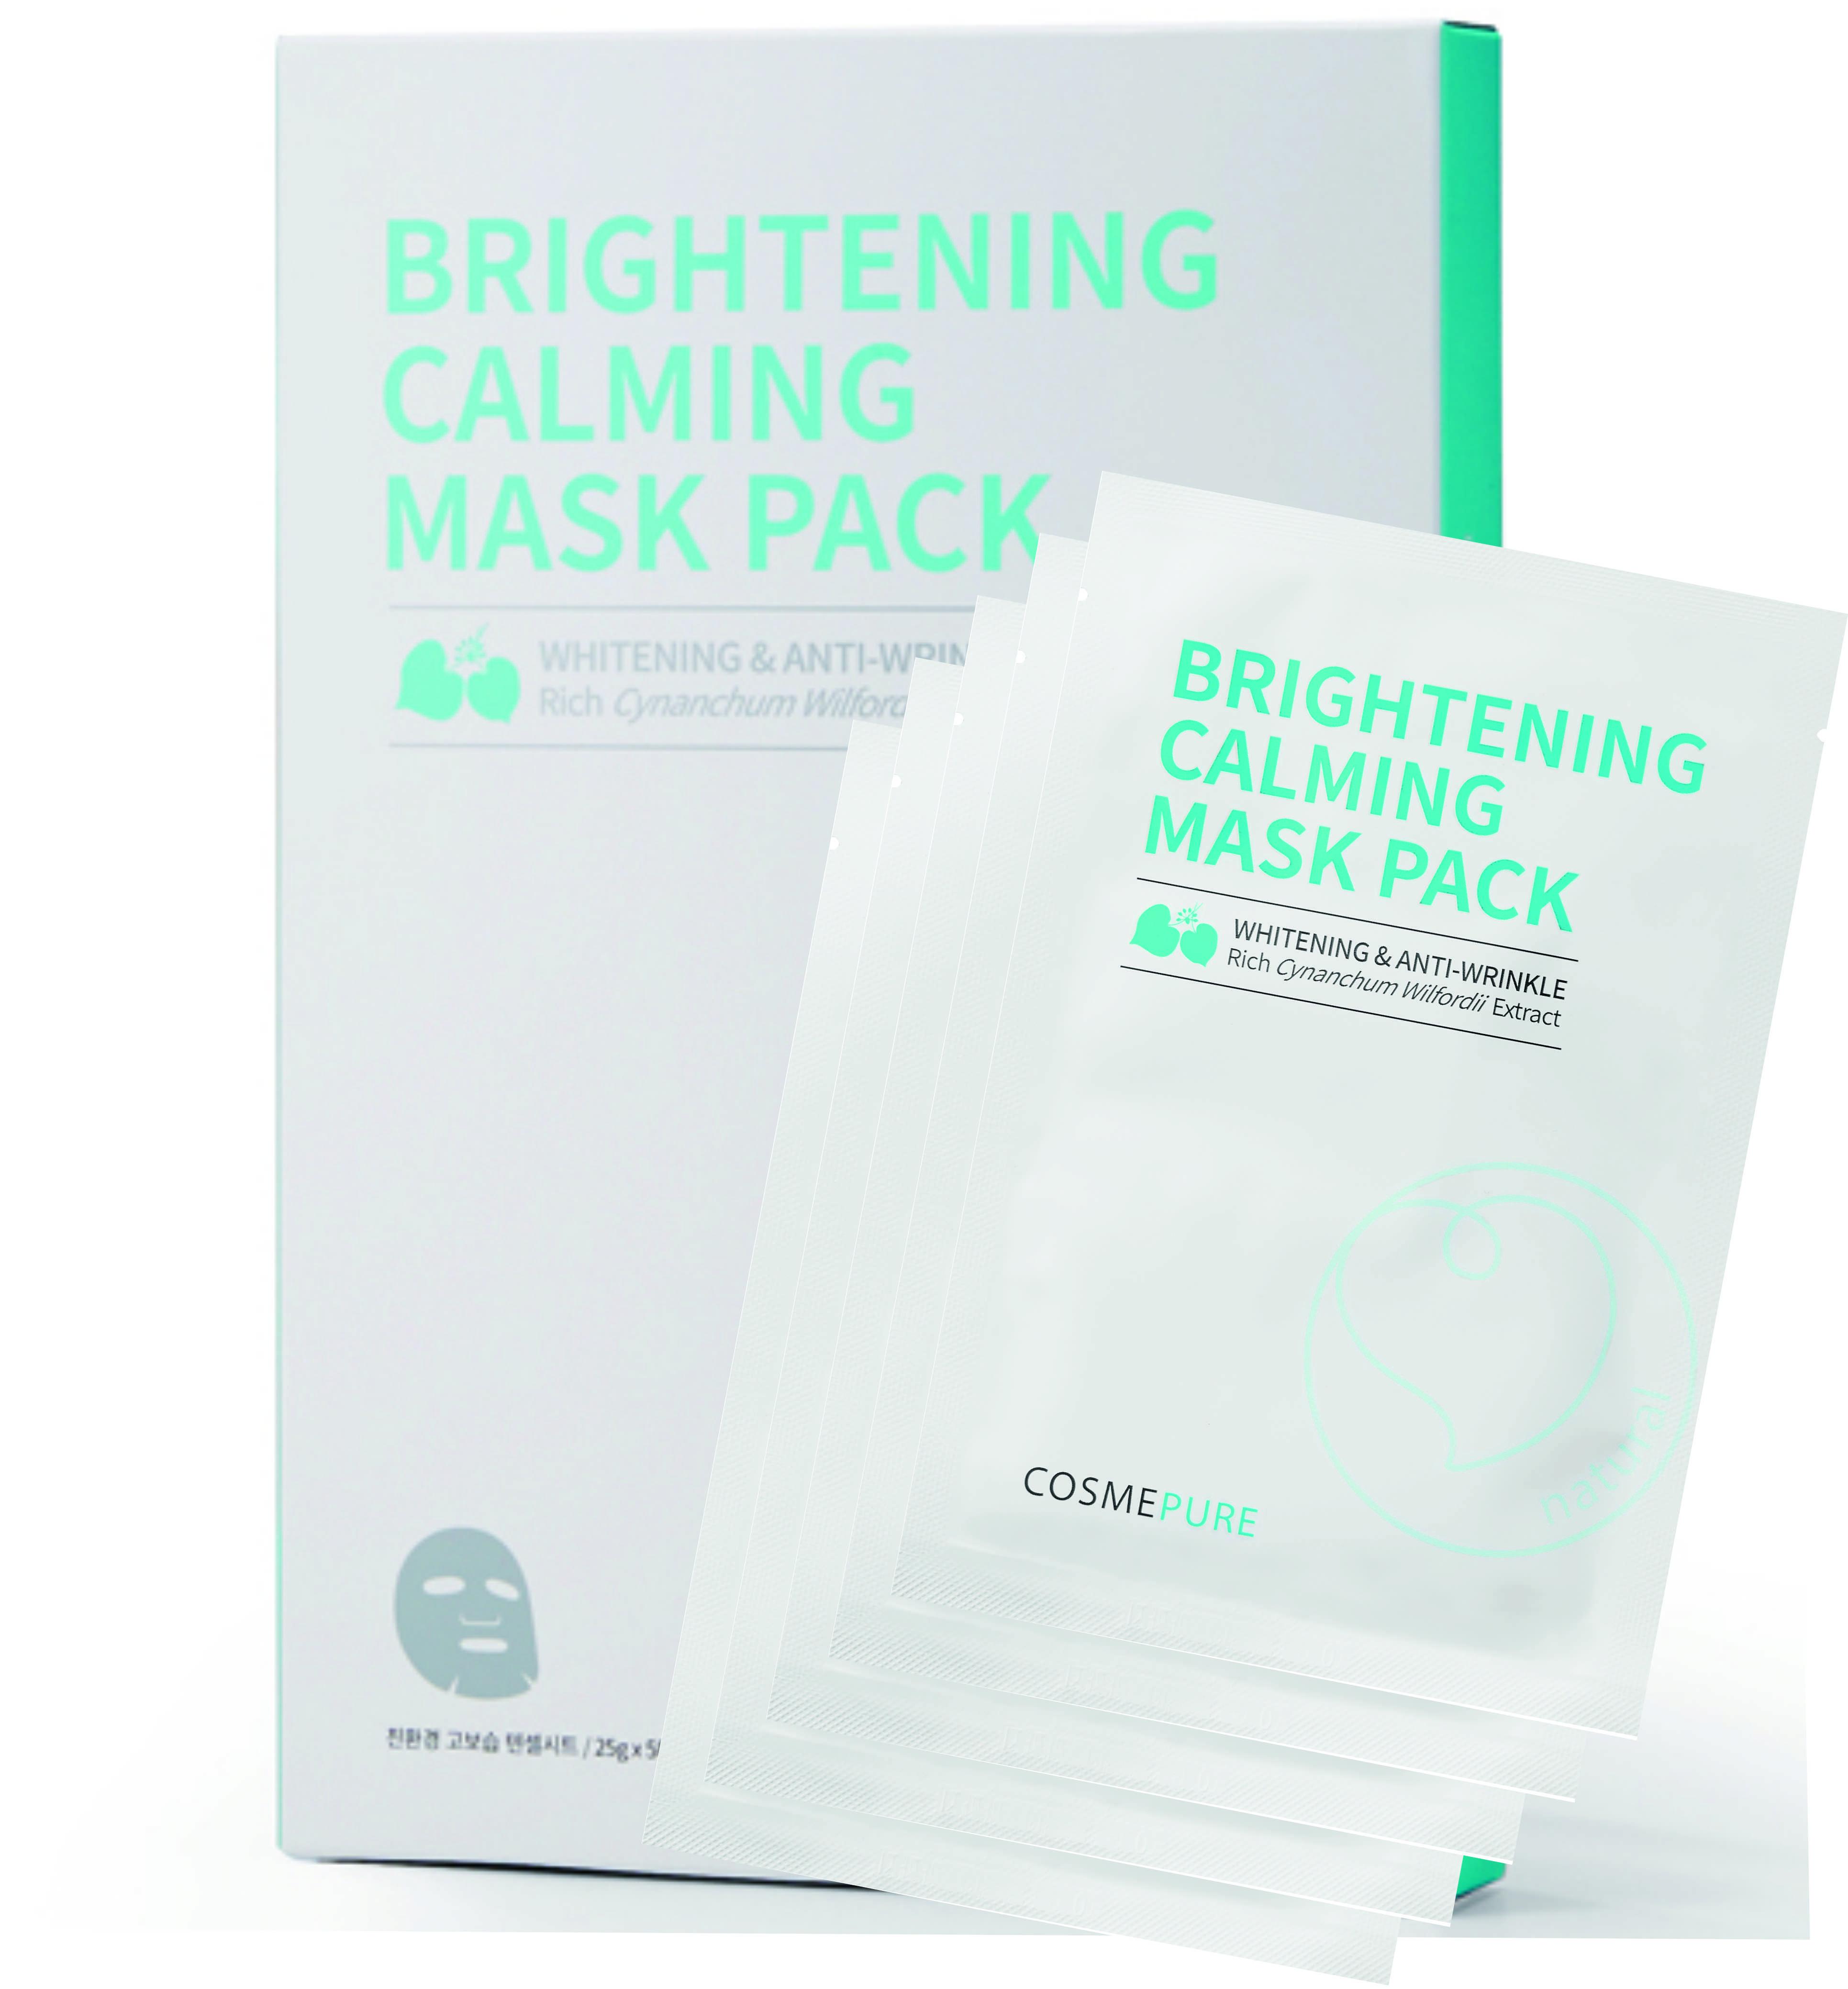 Cosmepure Brightening Calming Mask Pack